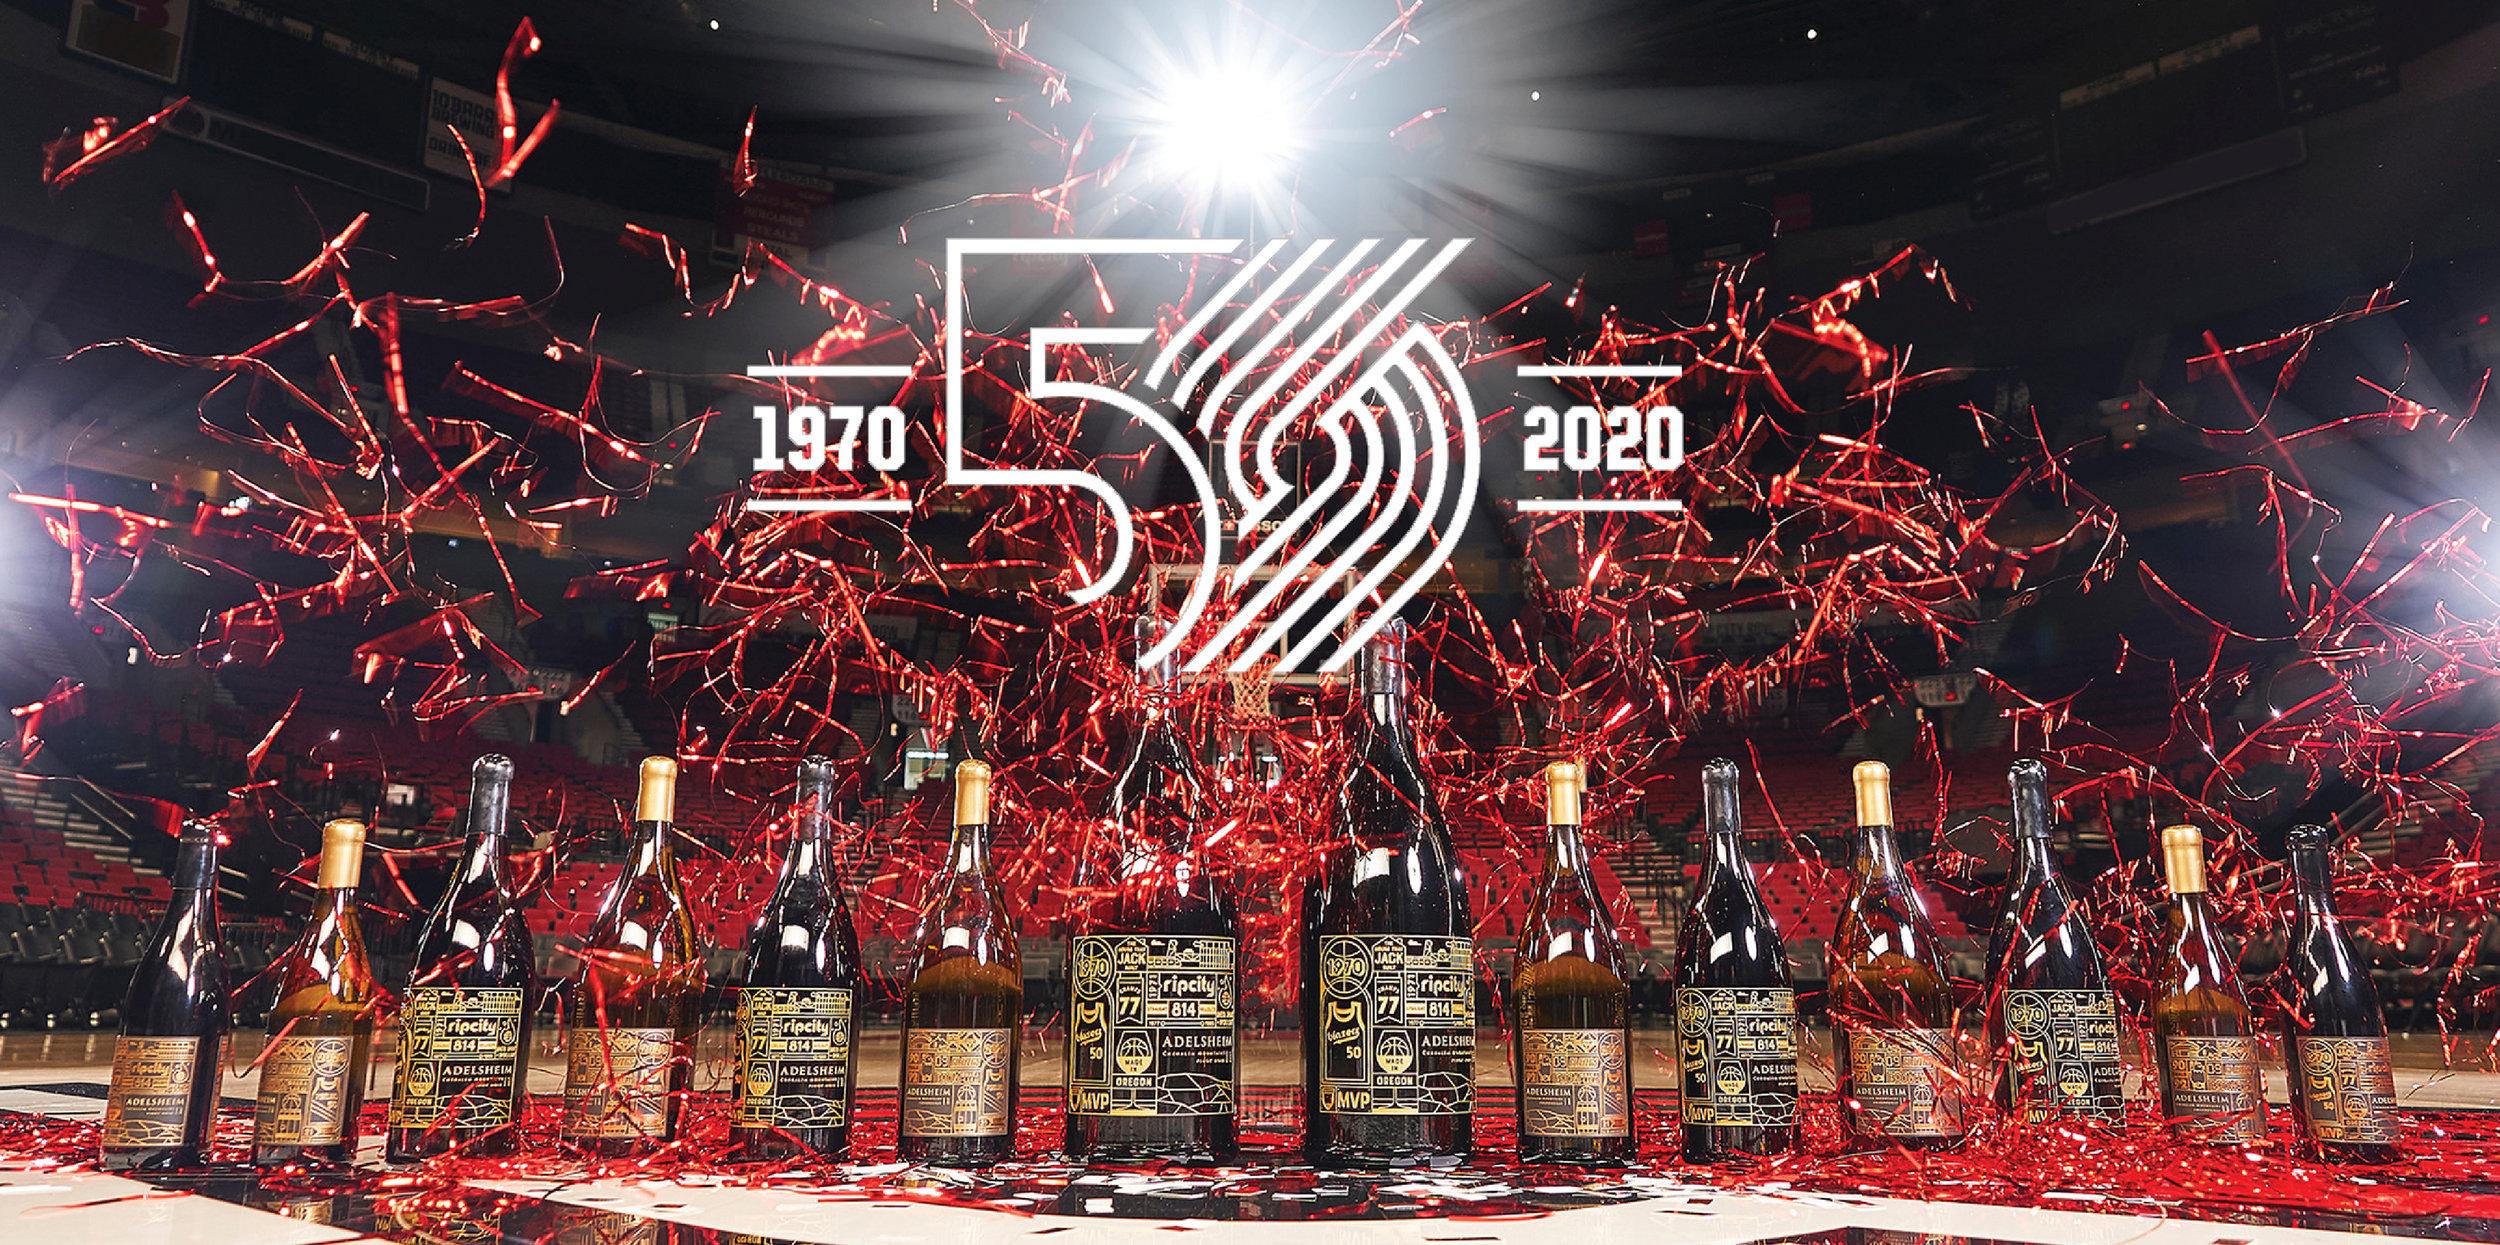 Portland Trail Blazers 50th Anniversary